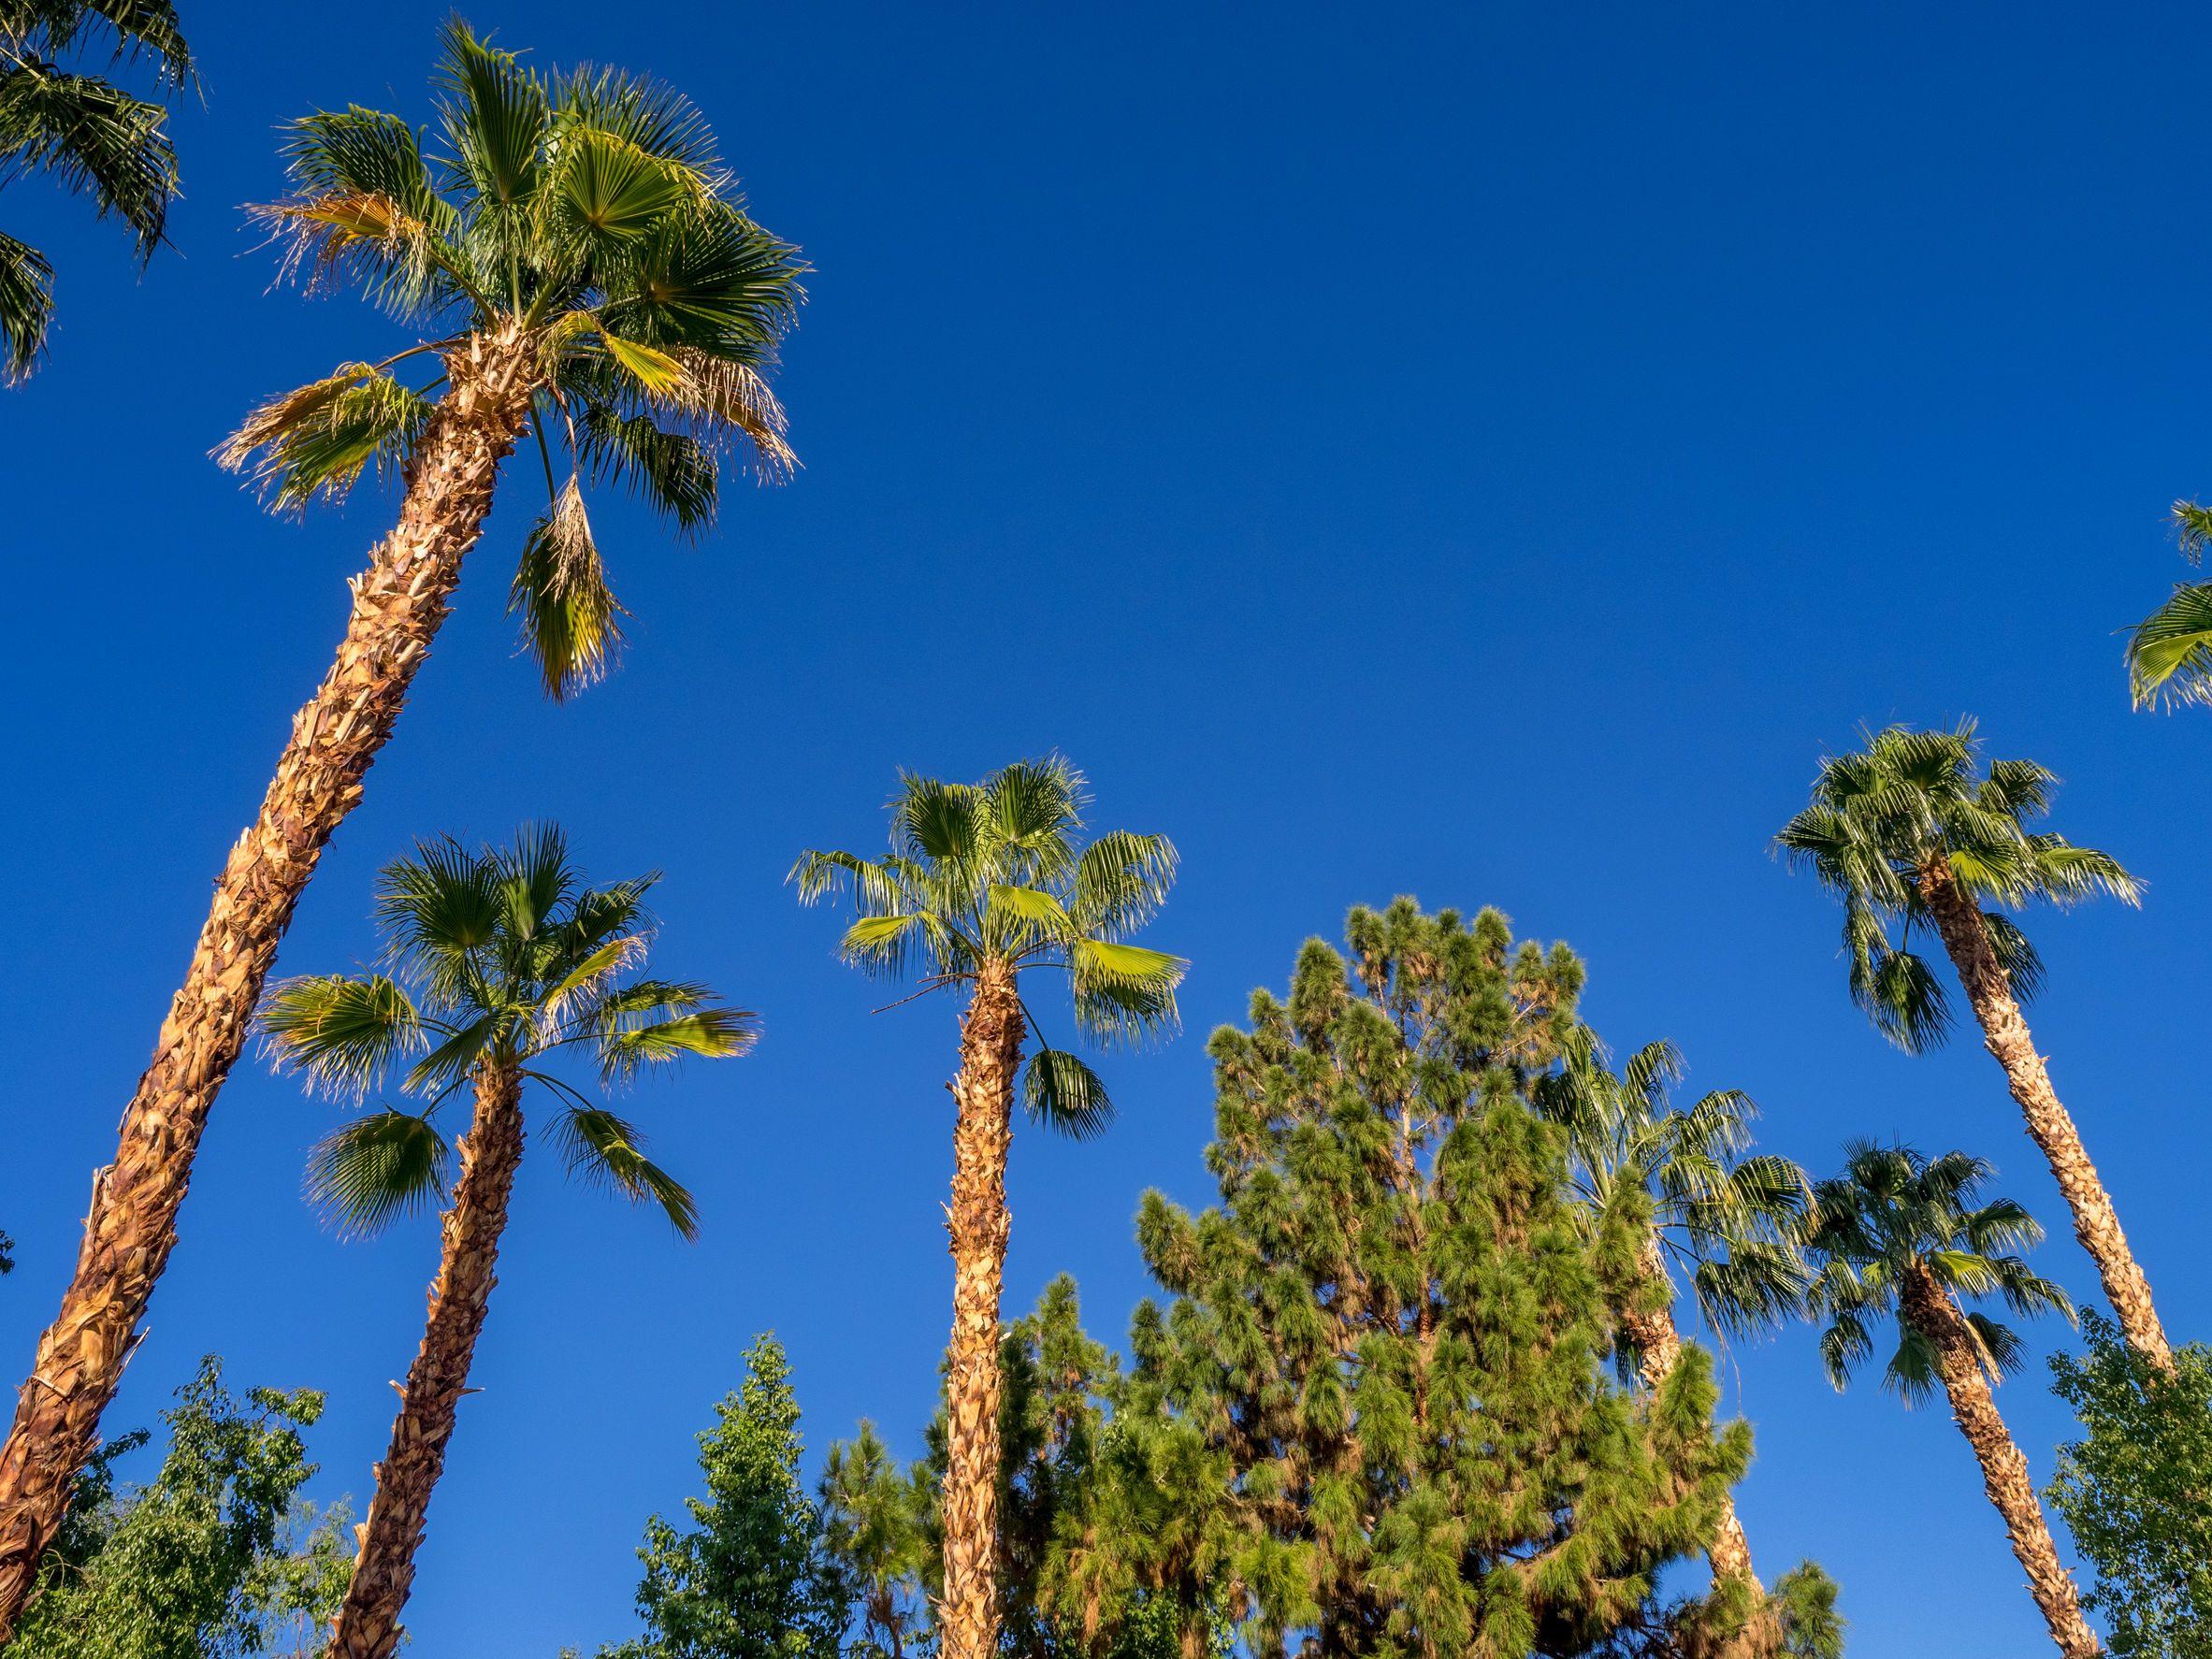 California marijuana regulators, California begins enforcement against unlicensed marijuana businesses